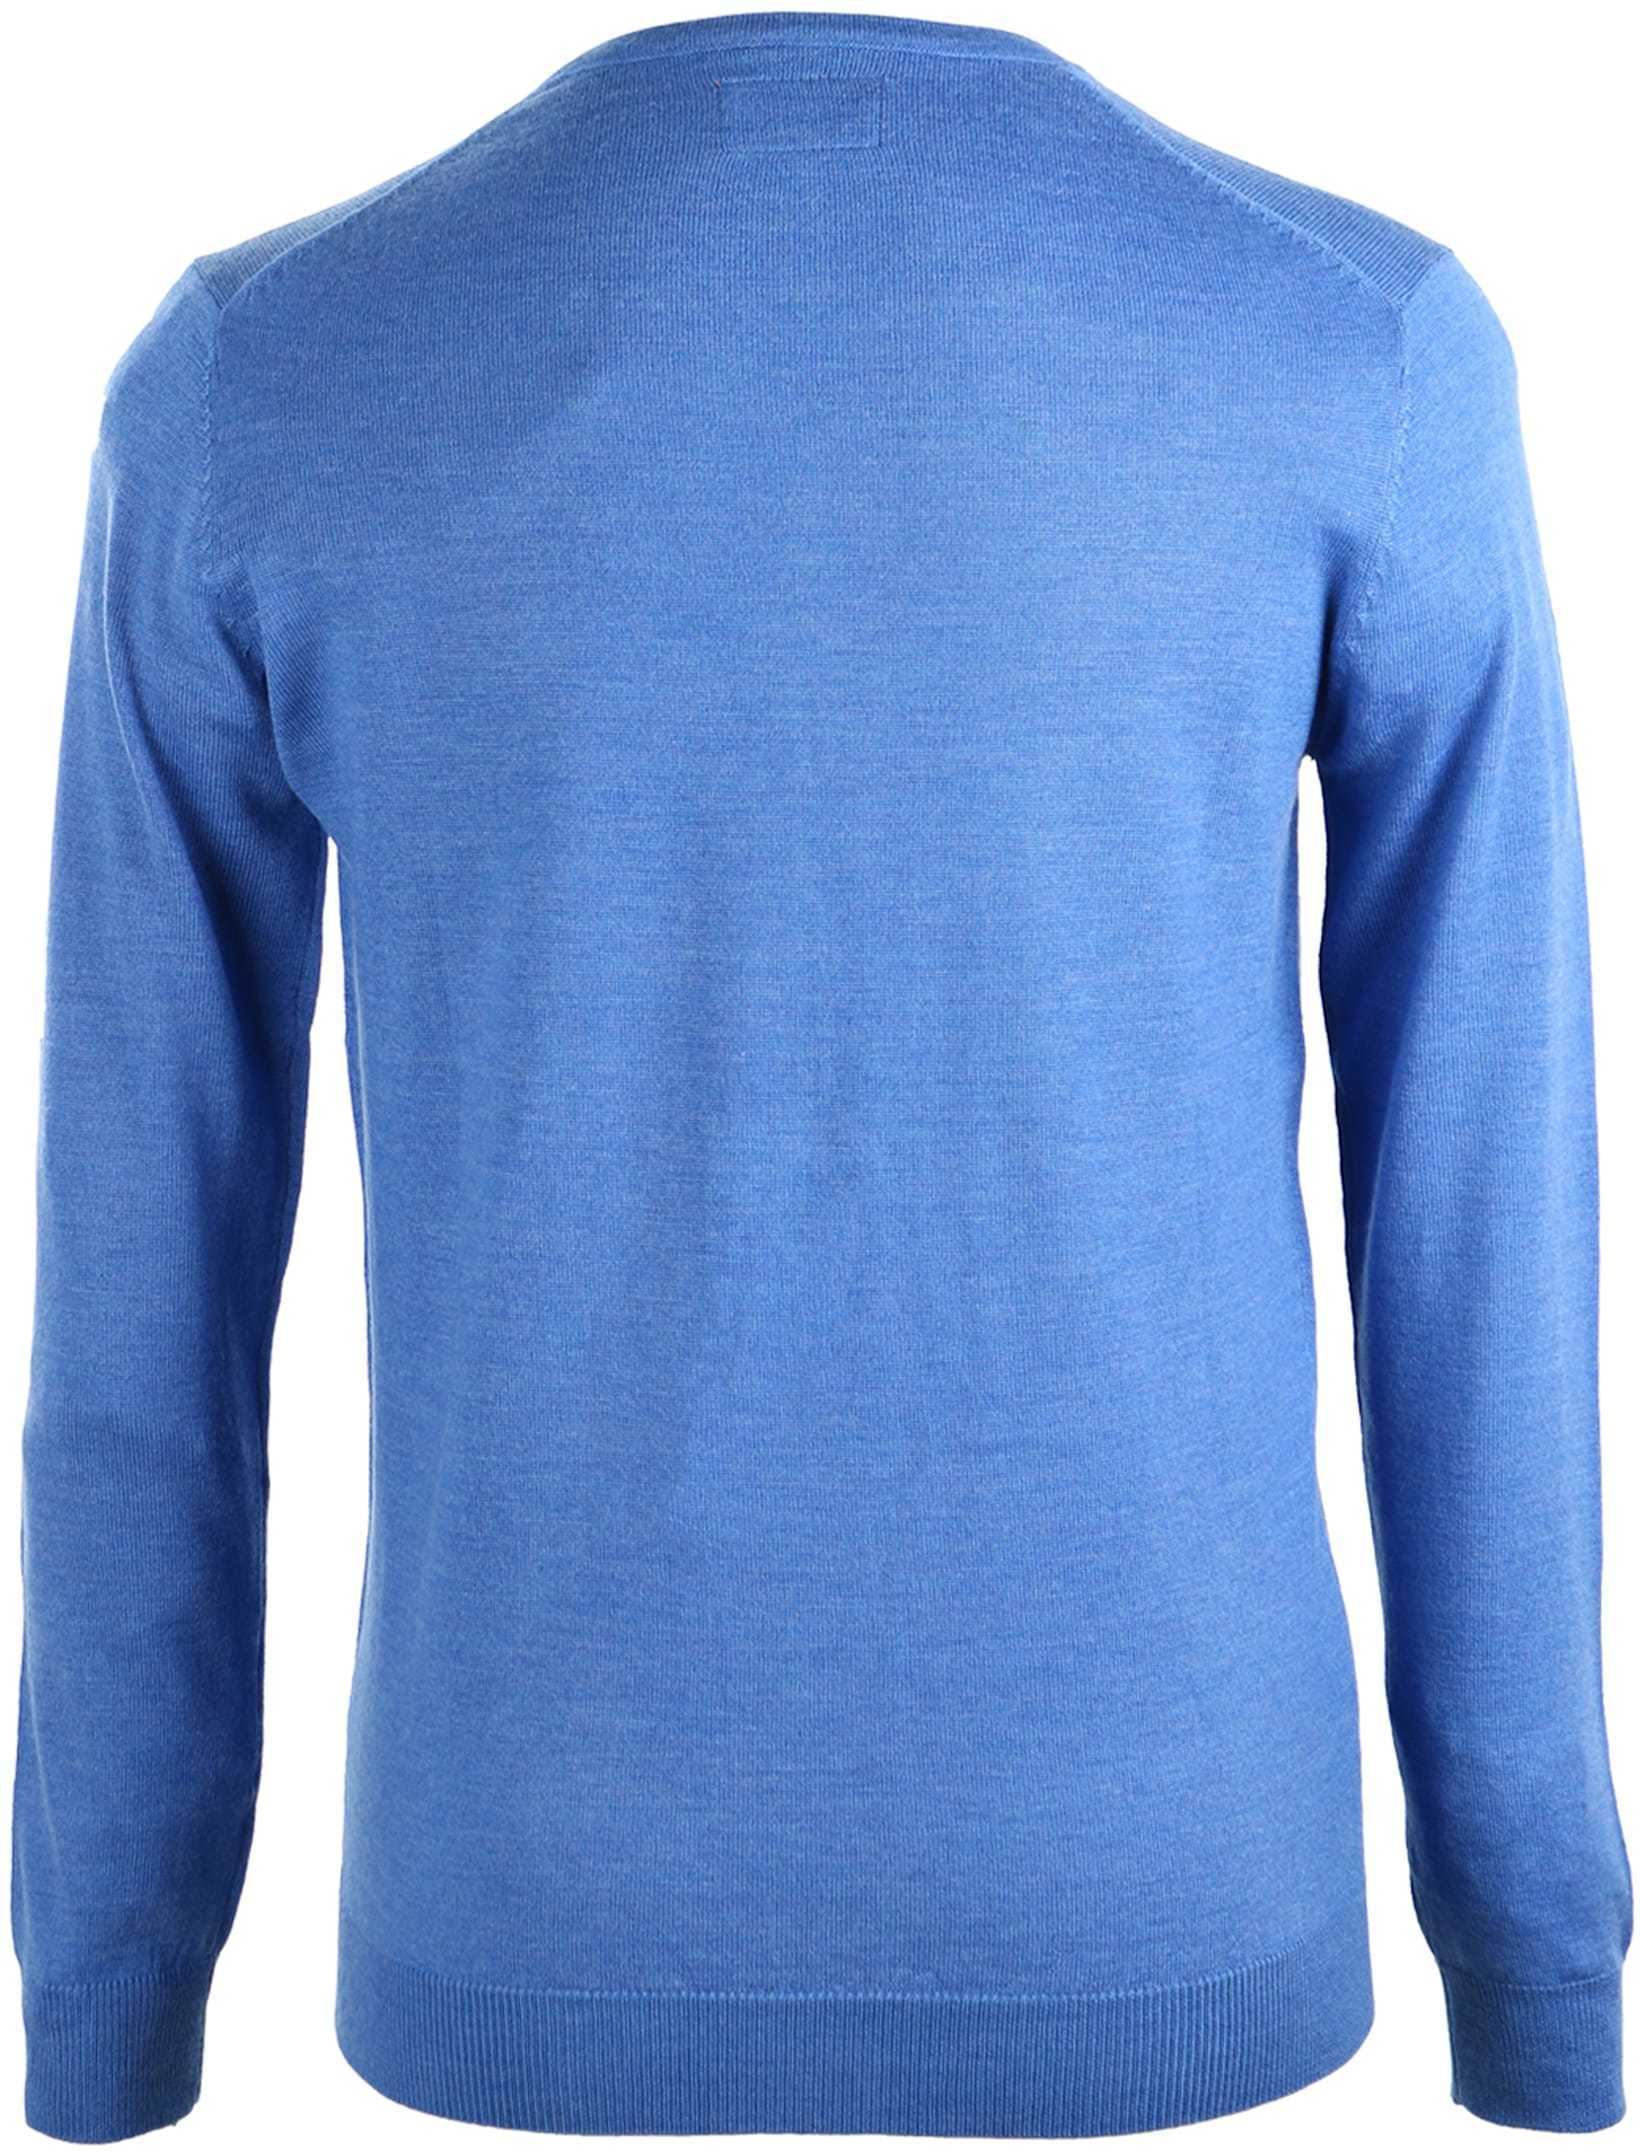 Suitable Merino Wool Pullover Blue foto 1